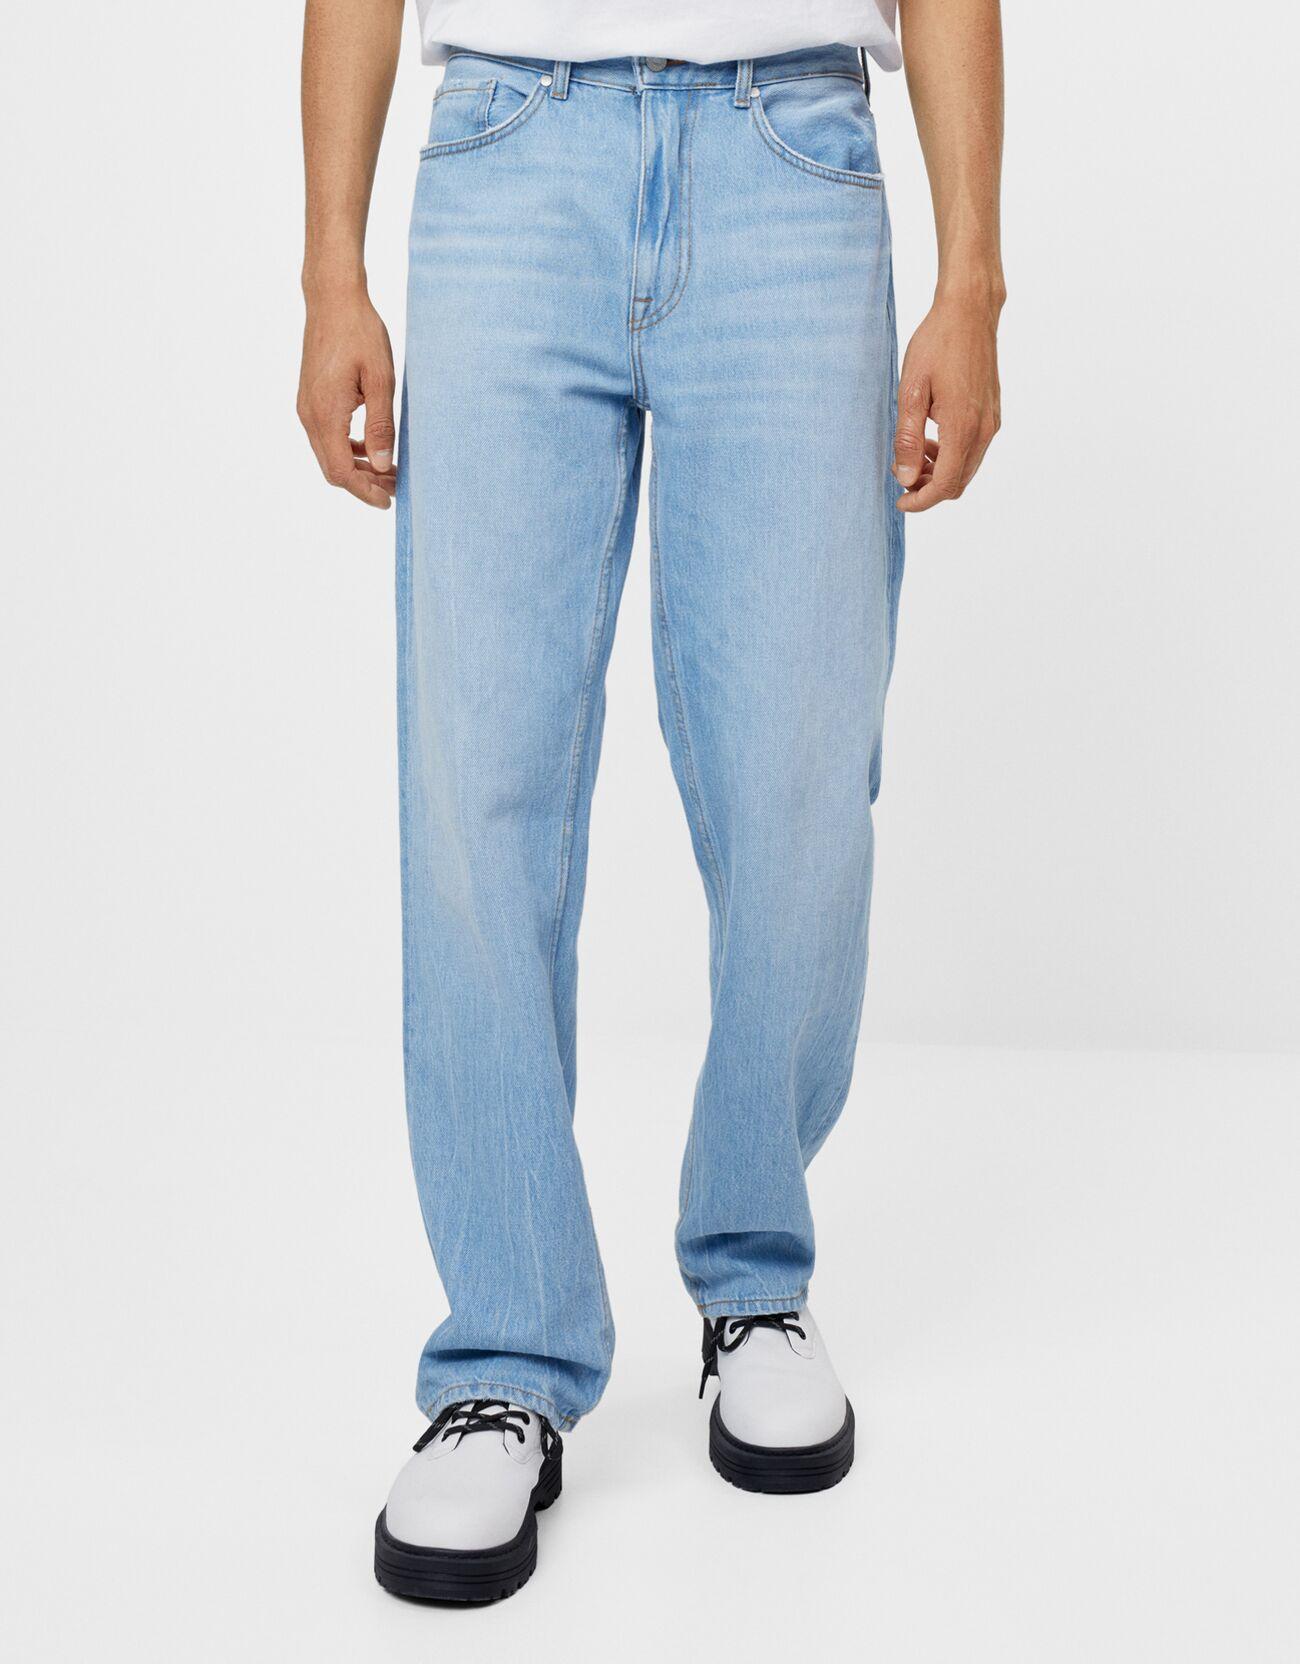 90s straight-leg jeans